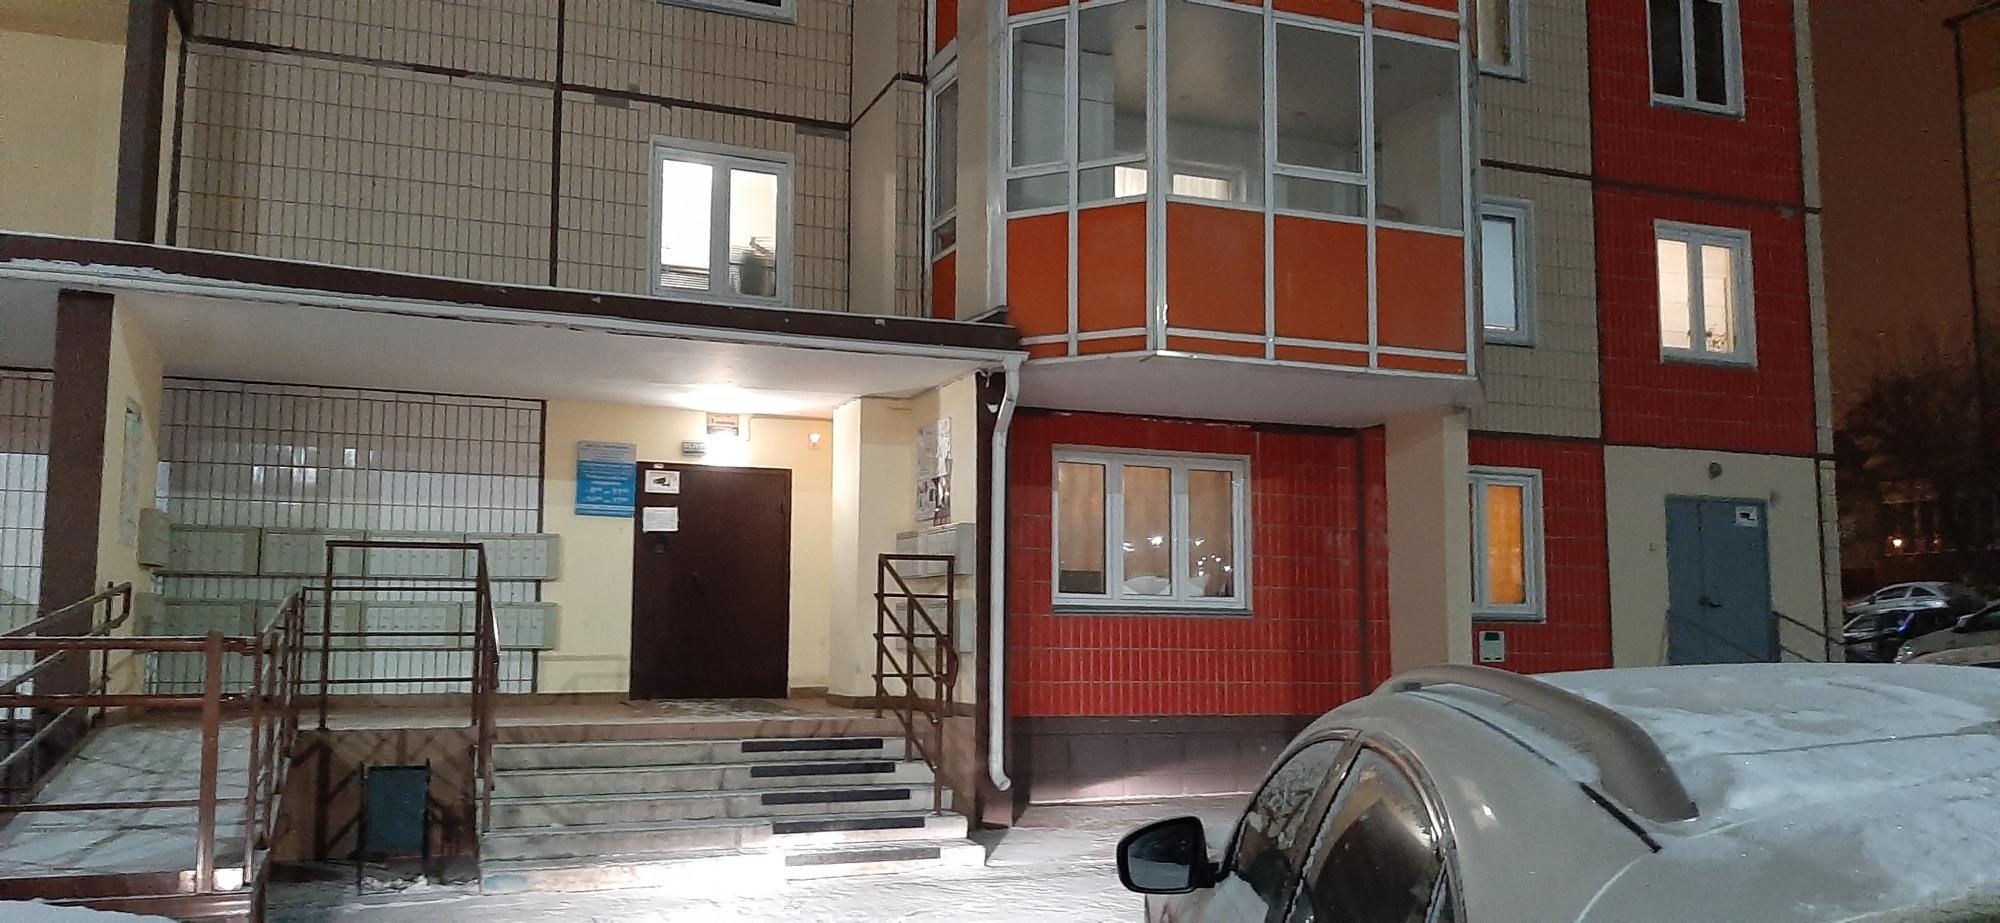 1к квартира Сопочная улица, 36 | 12000 | аренда в Красноярске фото 6